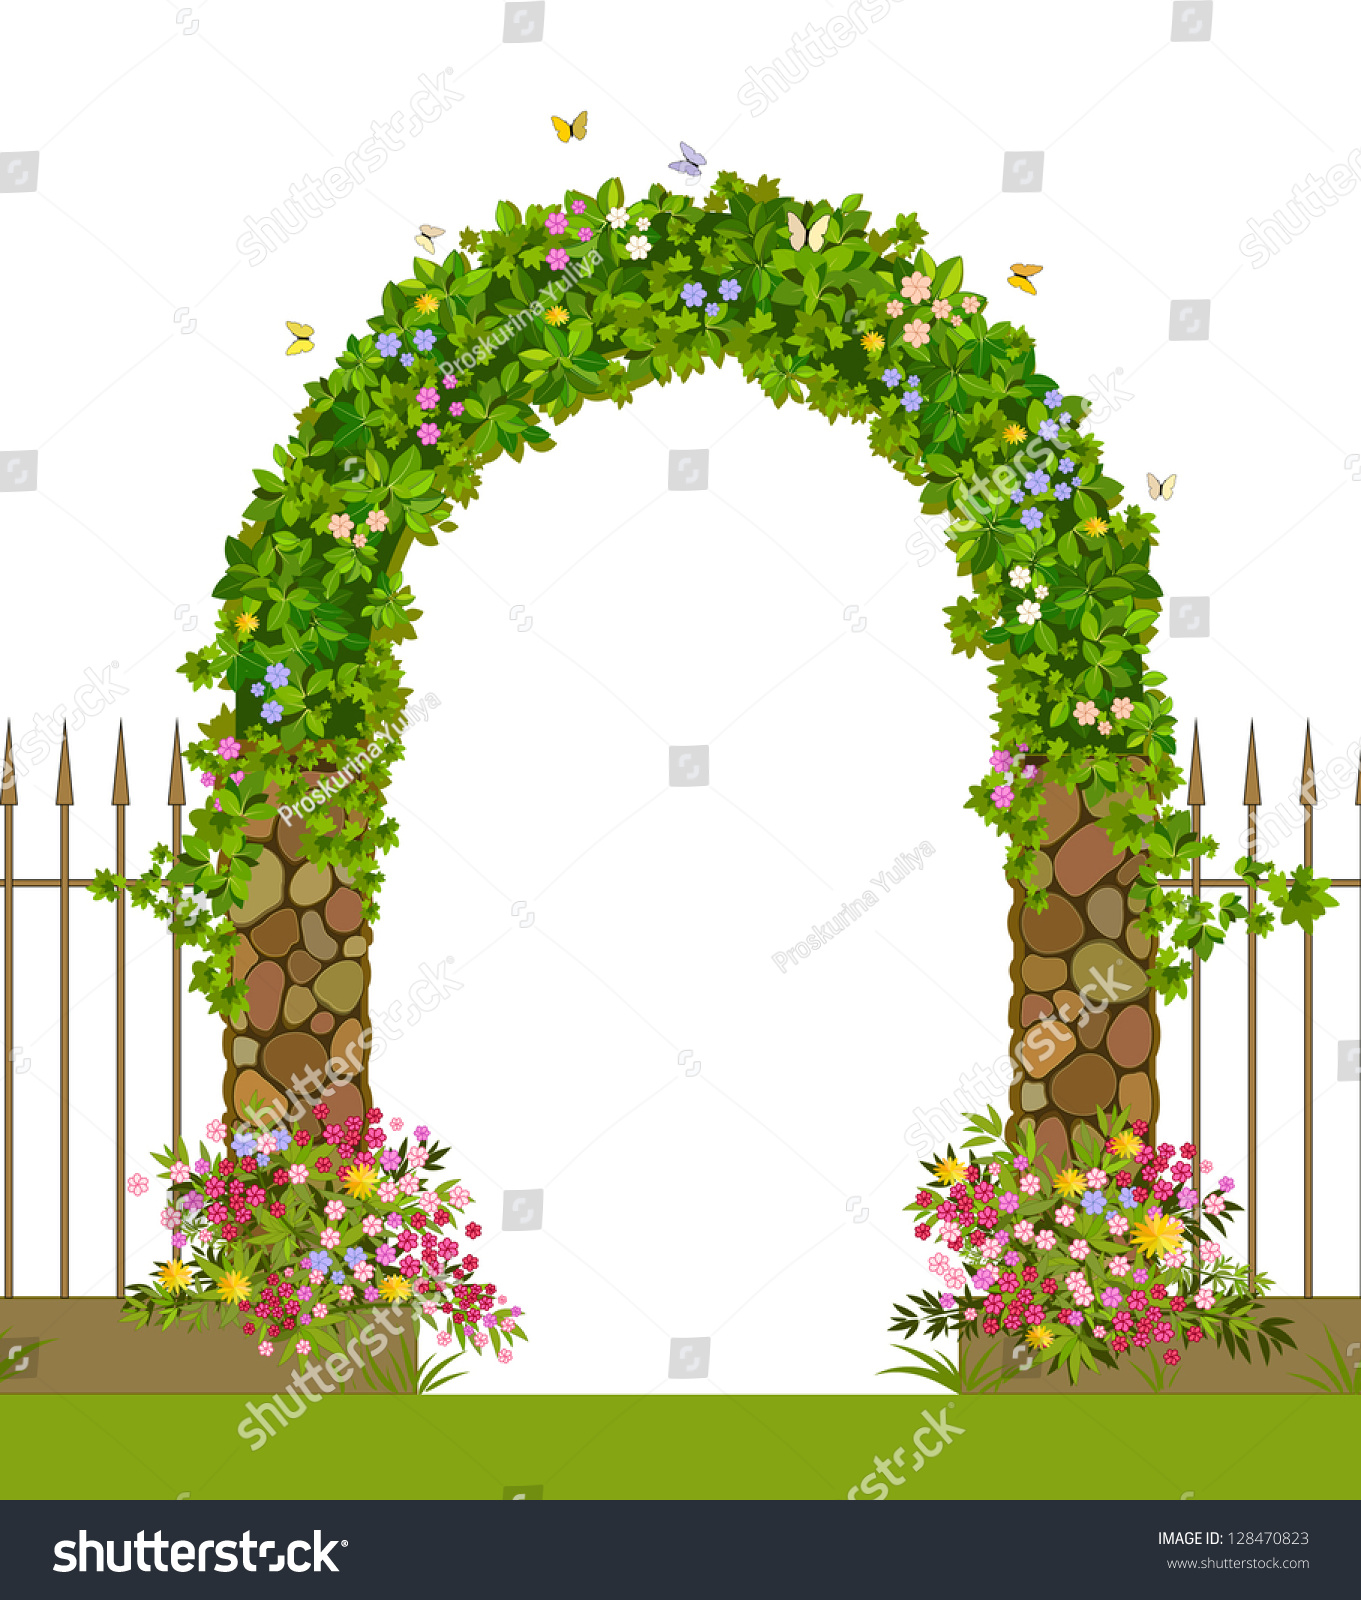 garden gate clipart - photo #19